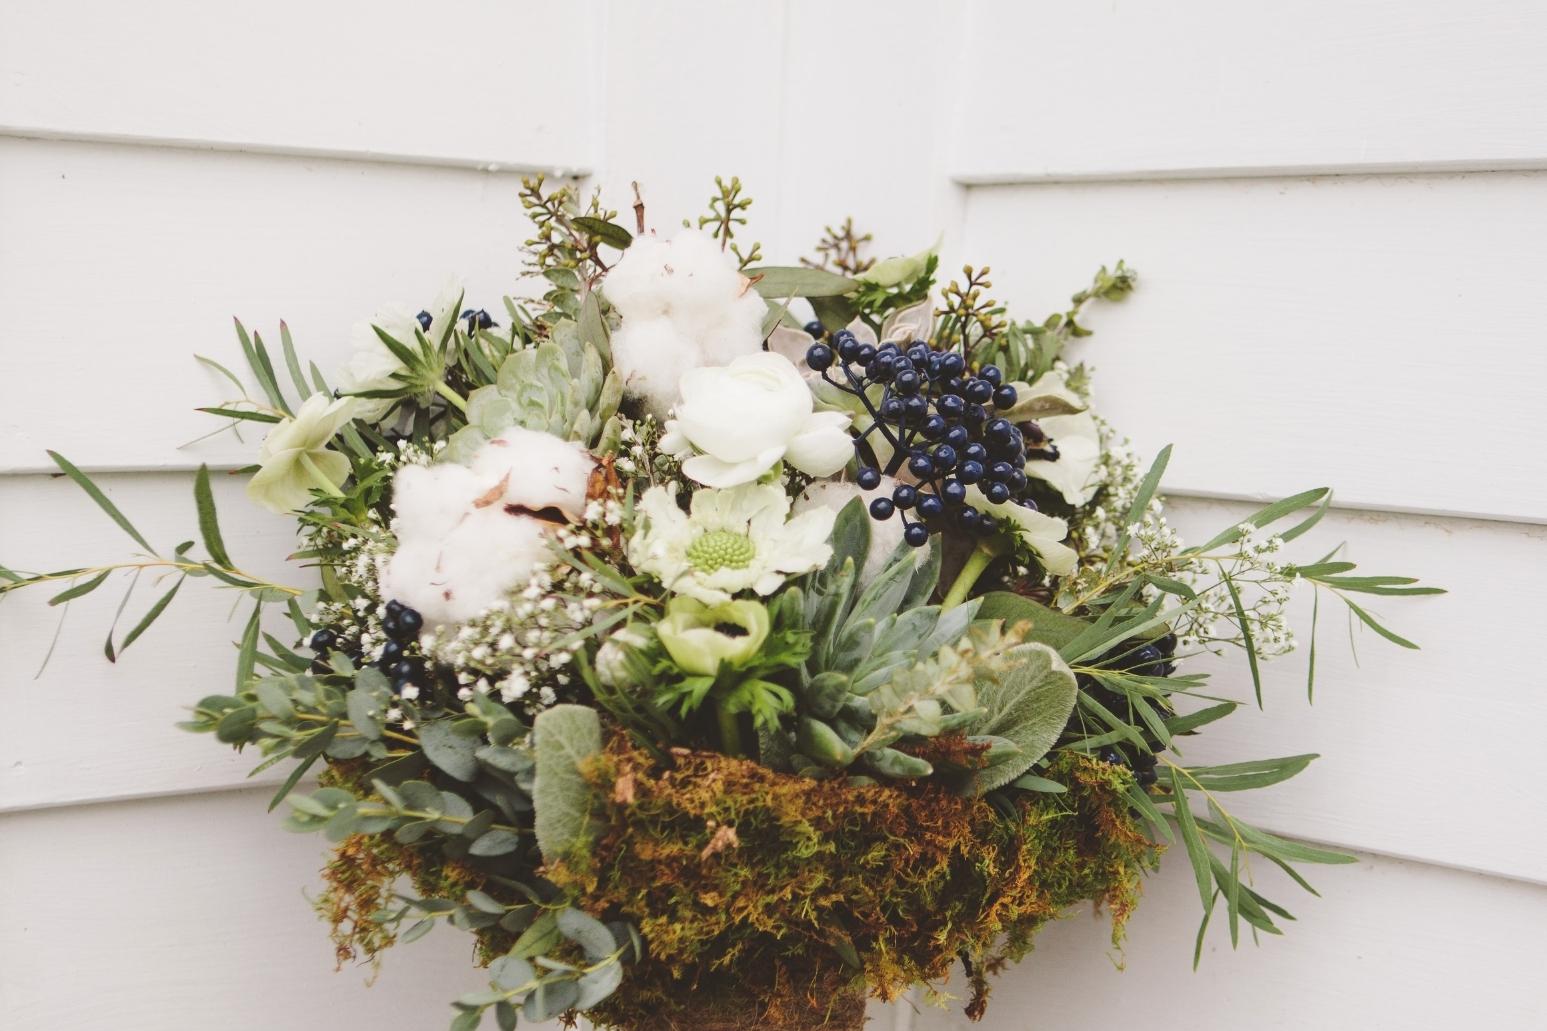 fern and floret botanical mn fern + floret minnesota wedding florist floral design mn minneapolis mpls st paul sharayah krautkremer